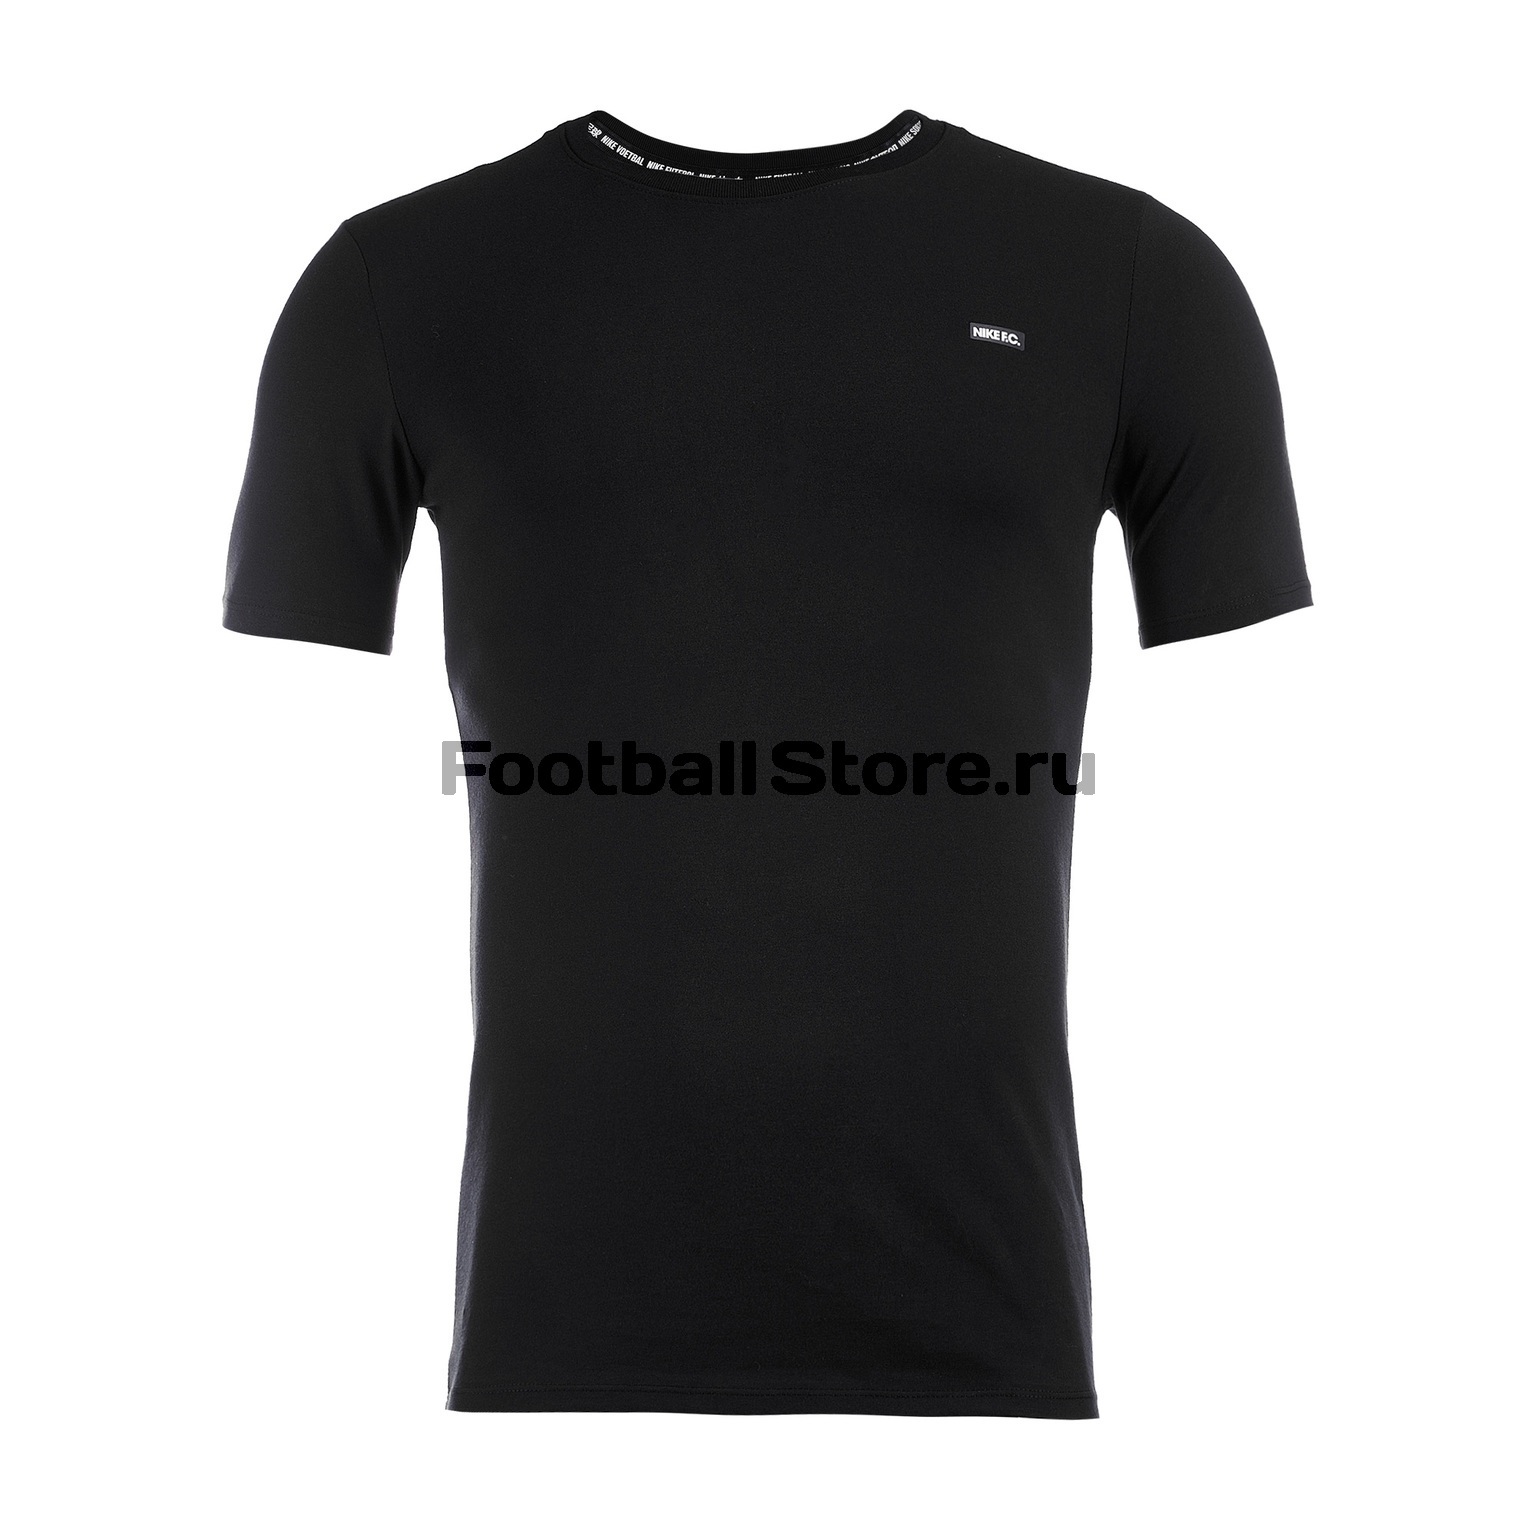 Футболка тренировочная Nike F.C. Dry Tee Small Block AH9657-010